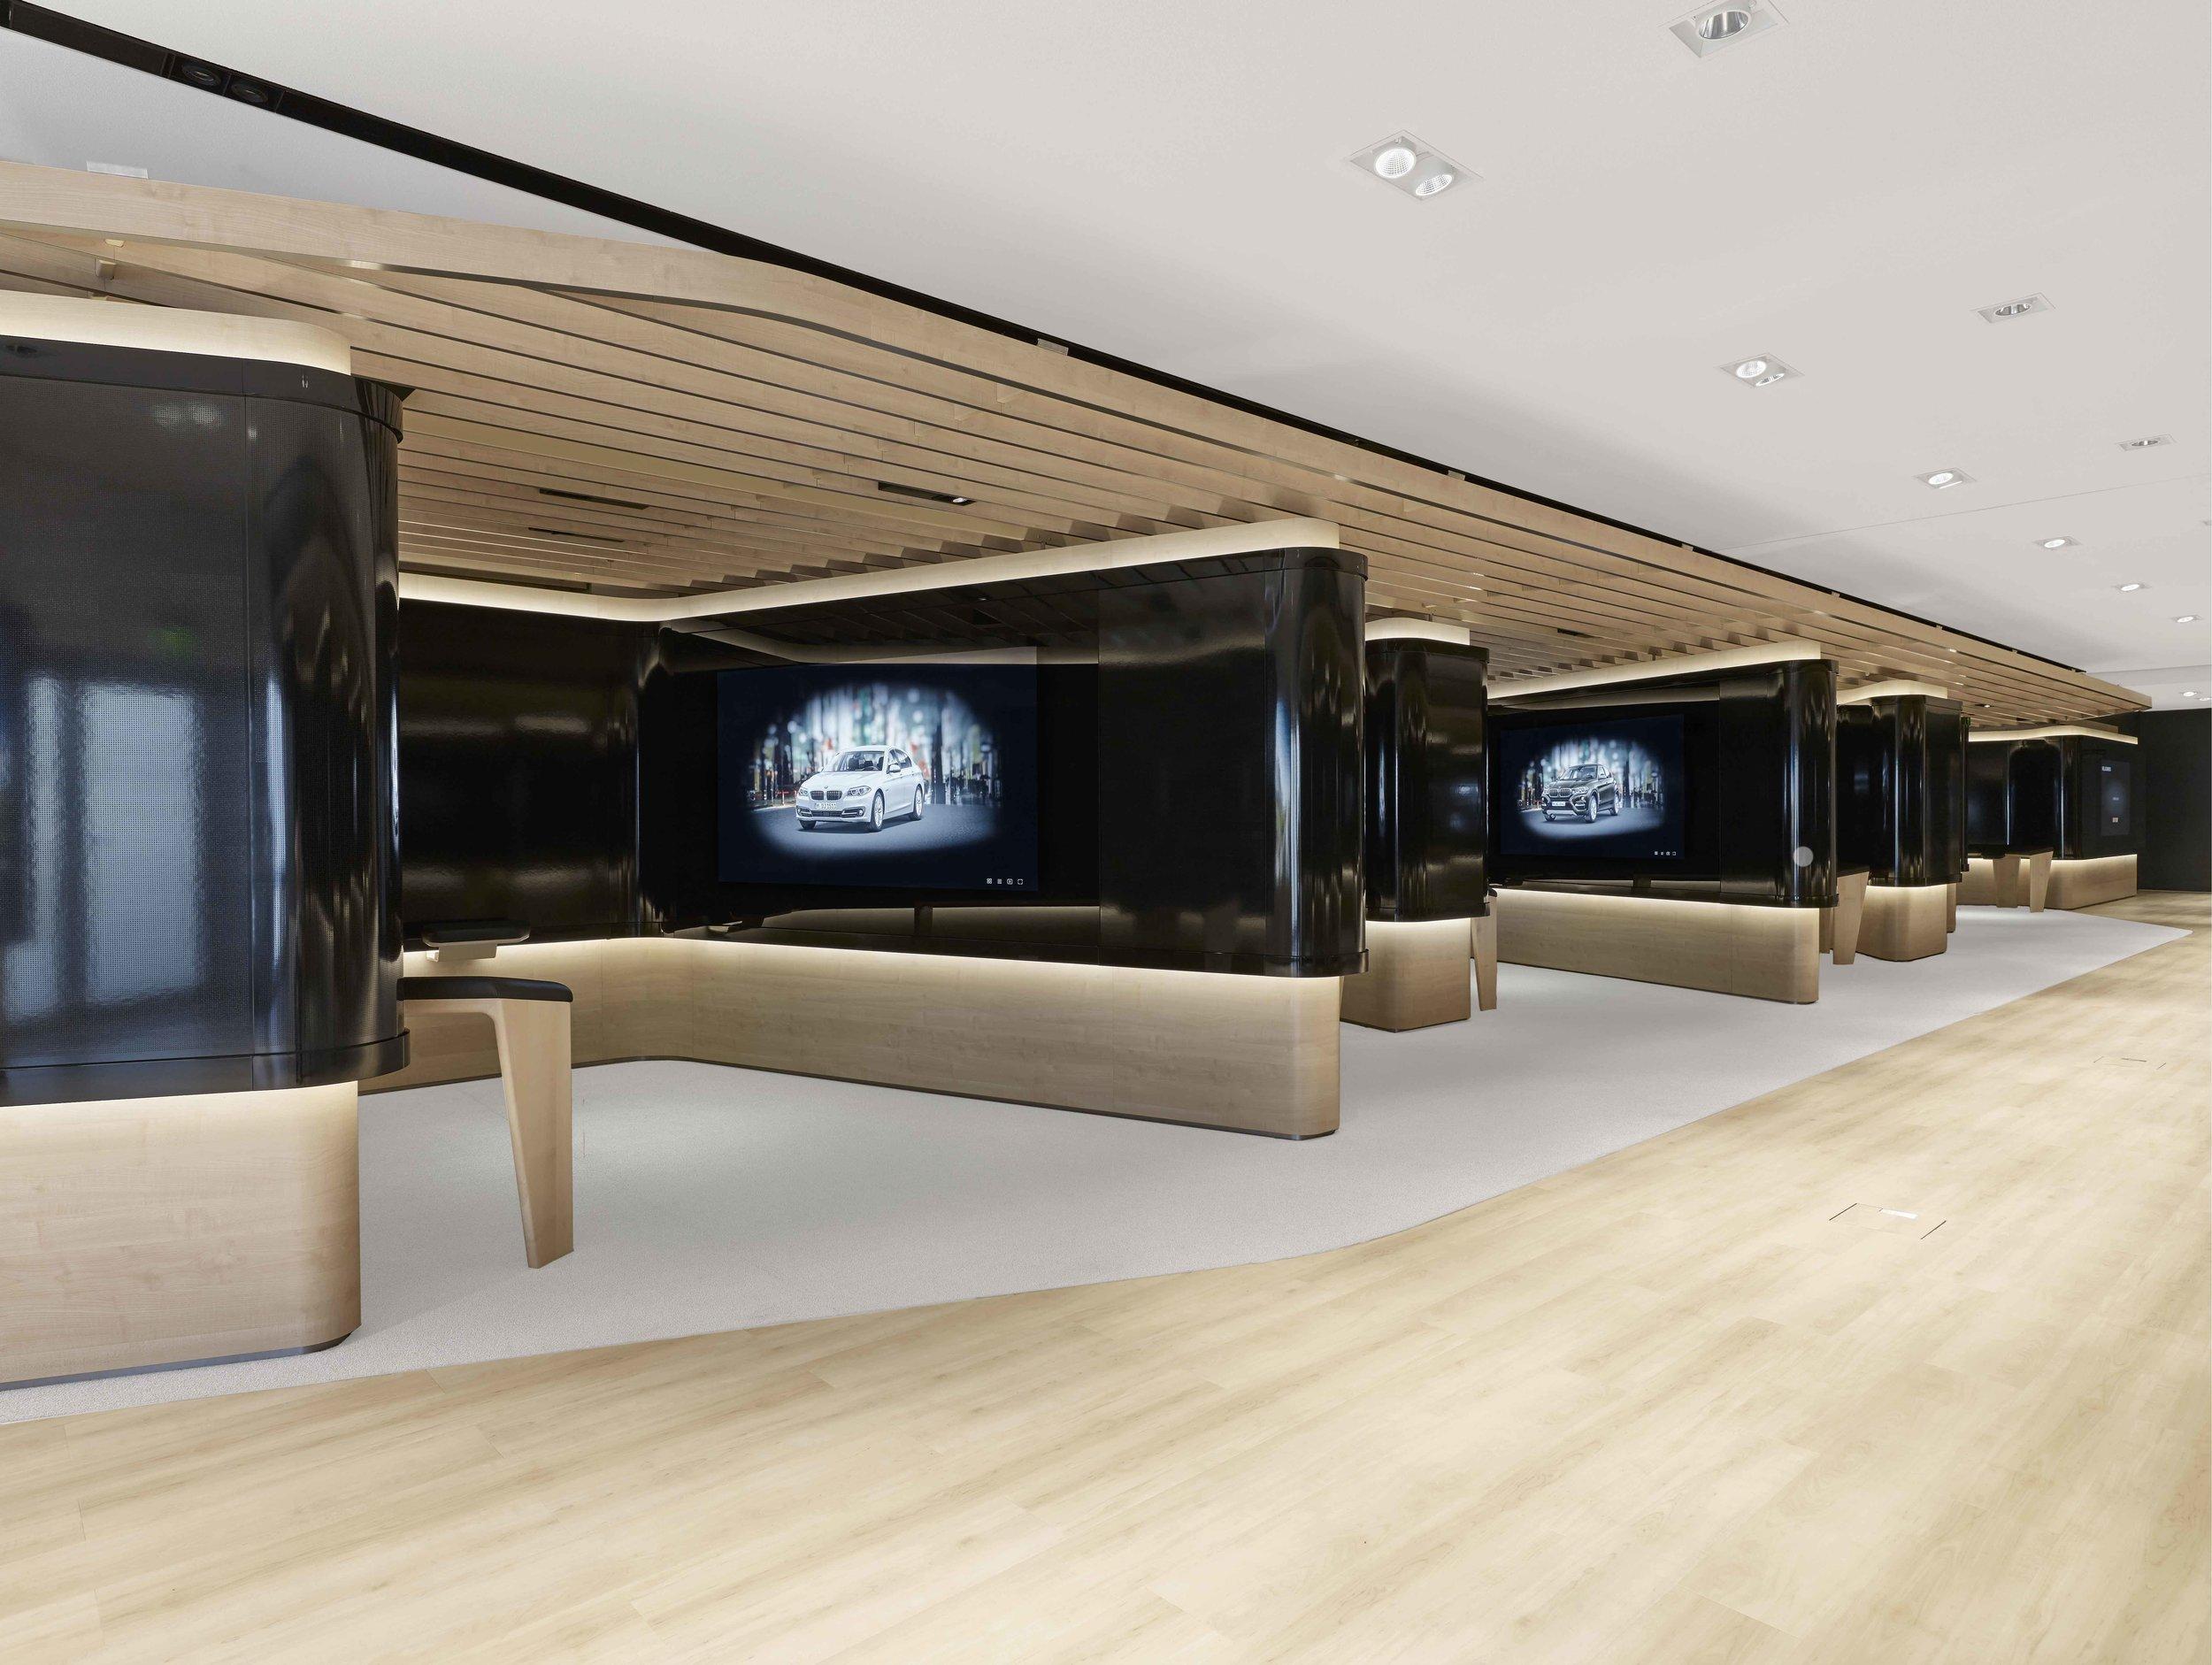 bmw-product-information-center_coorporate-interior-design_coordination-berlin_05.jpg